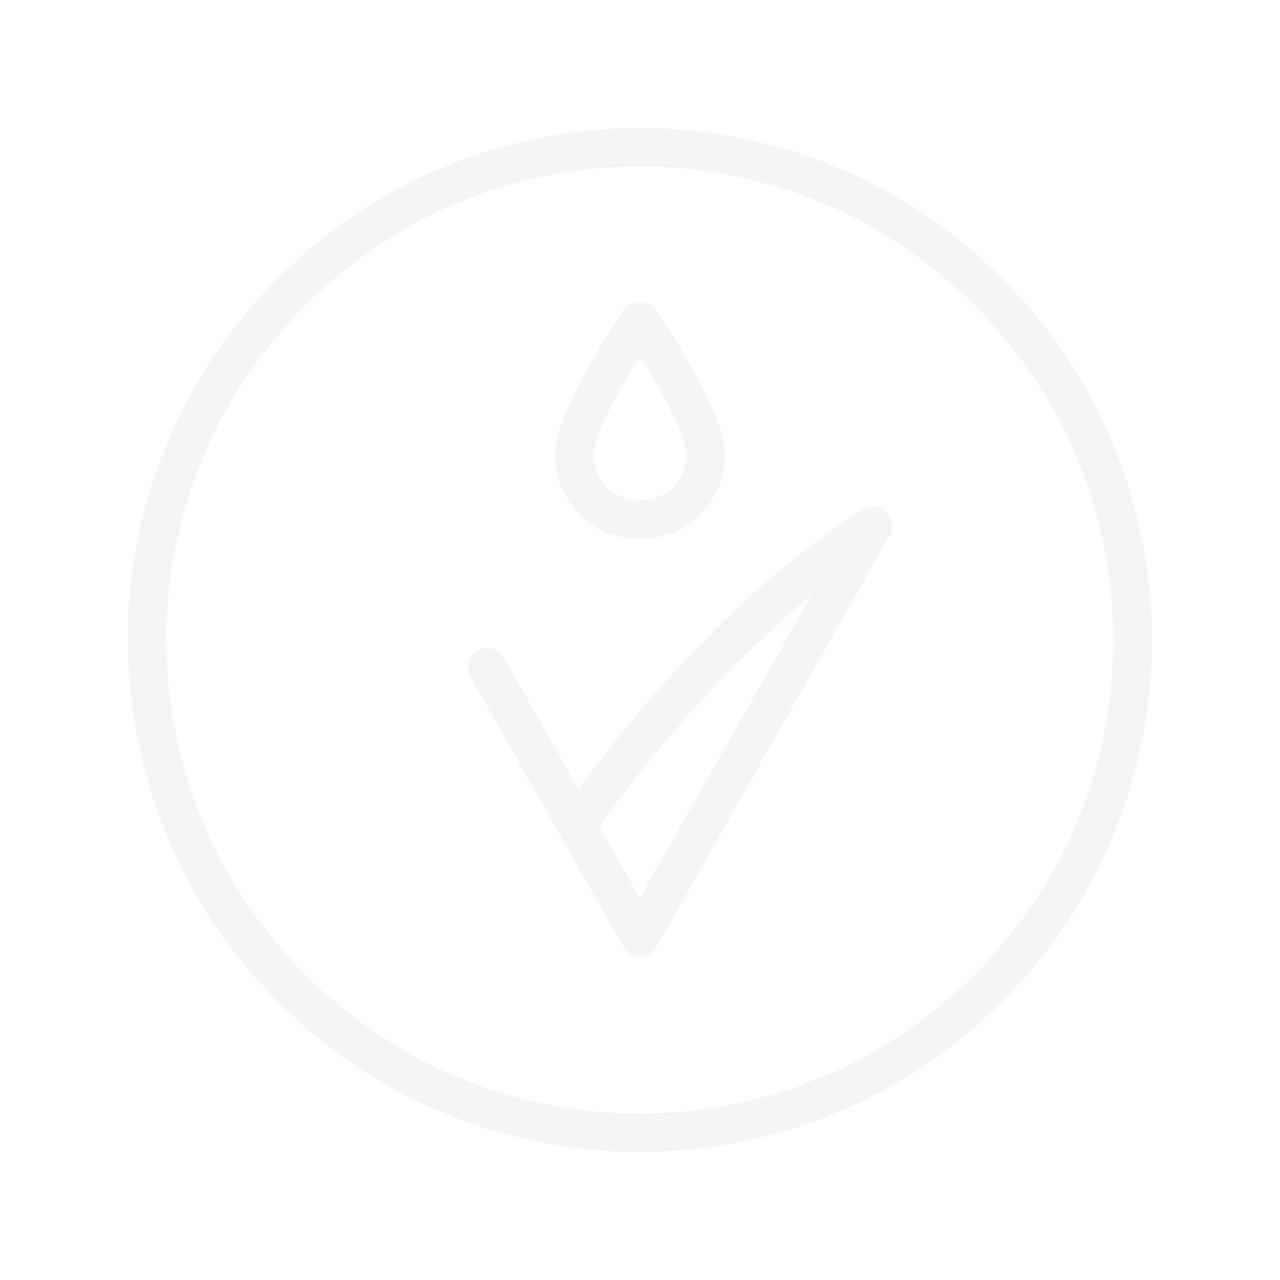 LÖWENGRIP Cell Renewal Facial Cleanser 75ml